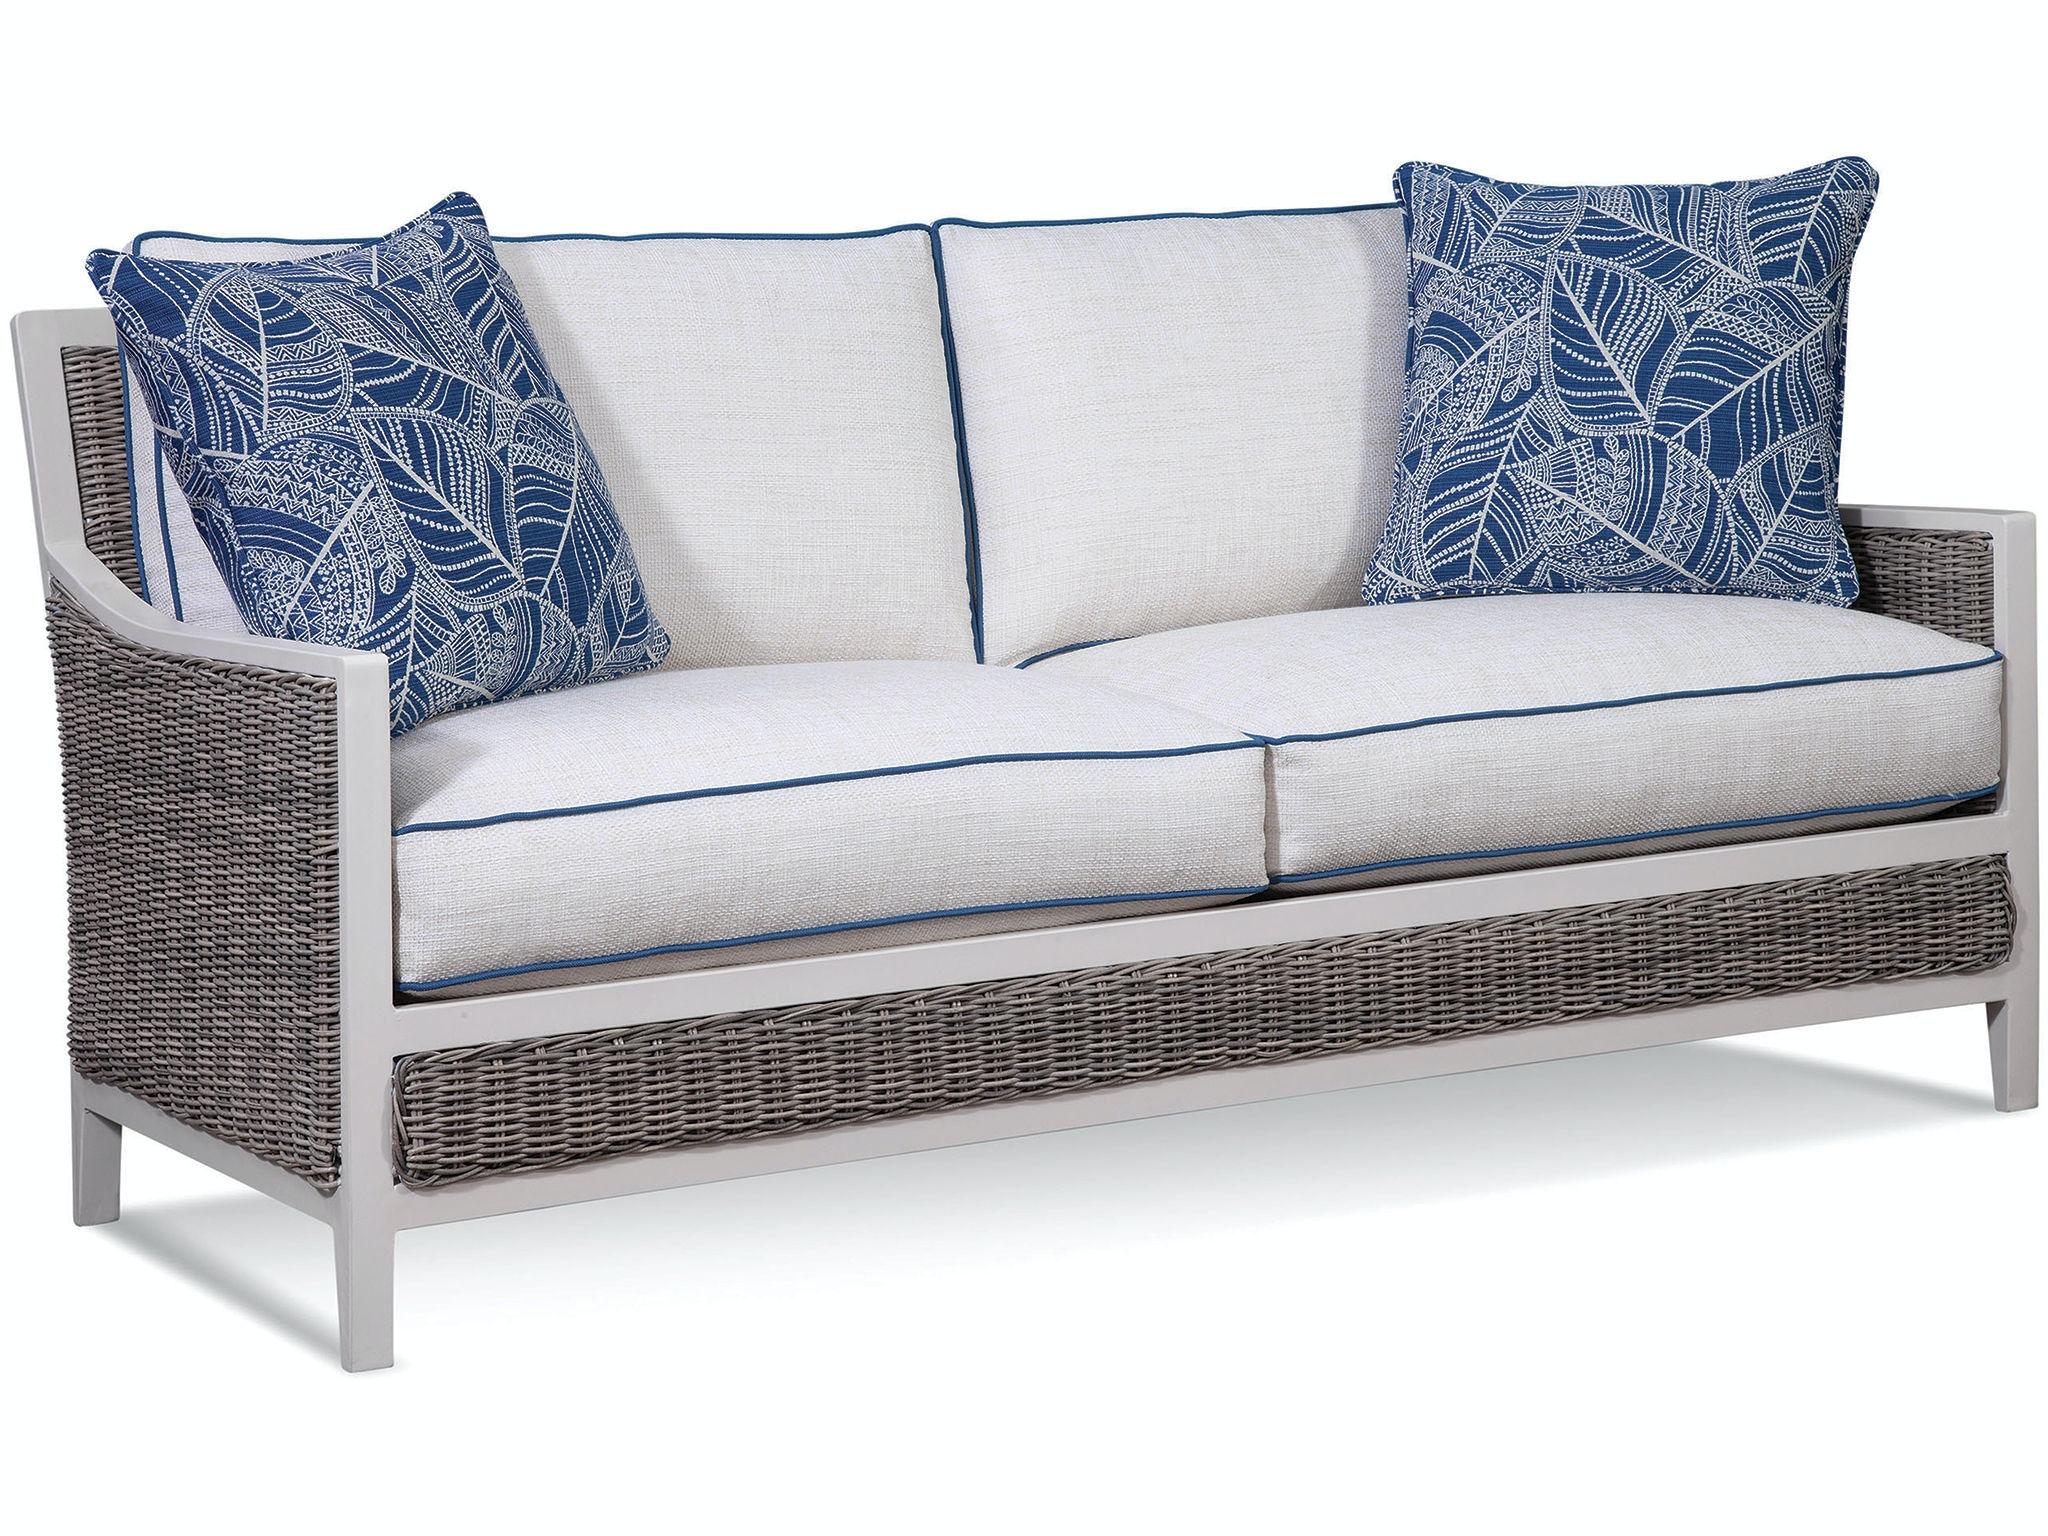 Superbe Braxton Culler Outdoor Two Cushion Sofa 418 011